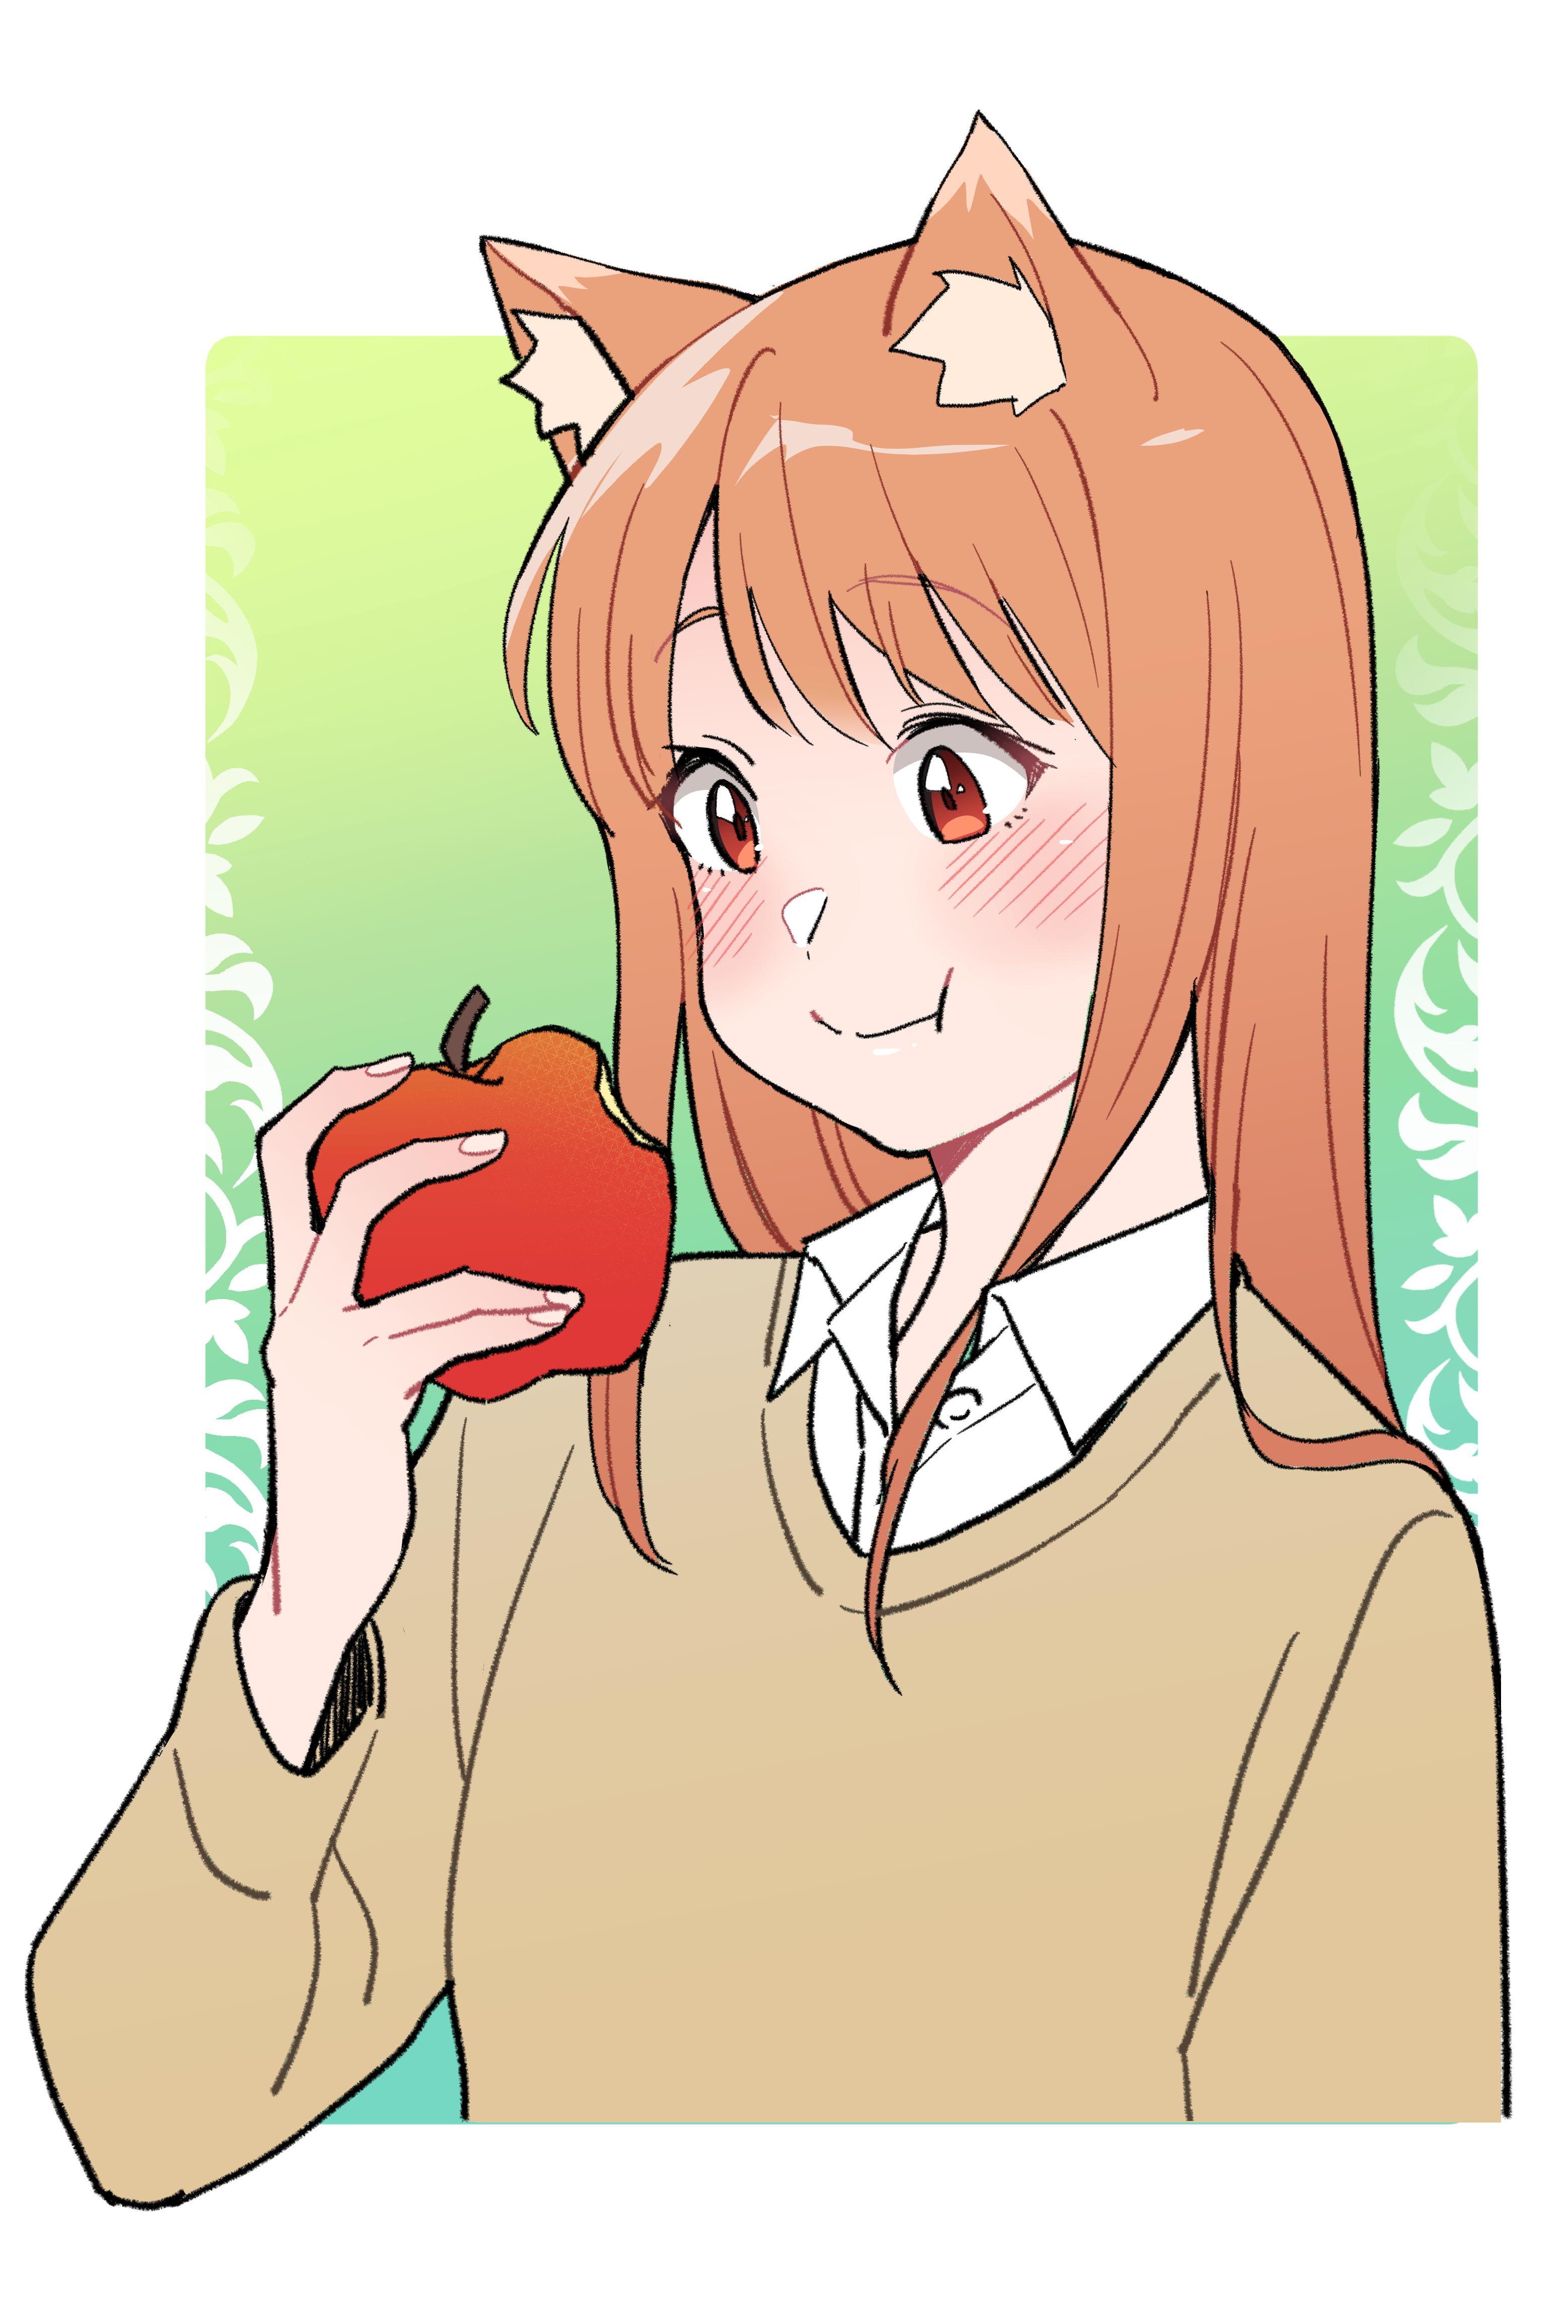 long hair, monster girl, small boobs, redhead, red eyes